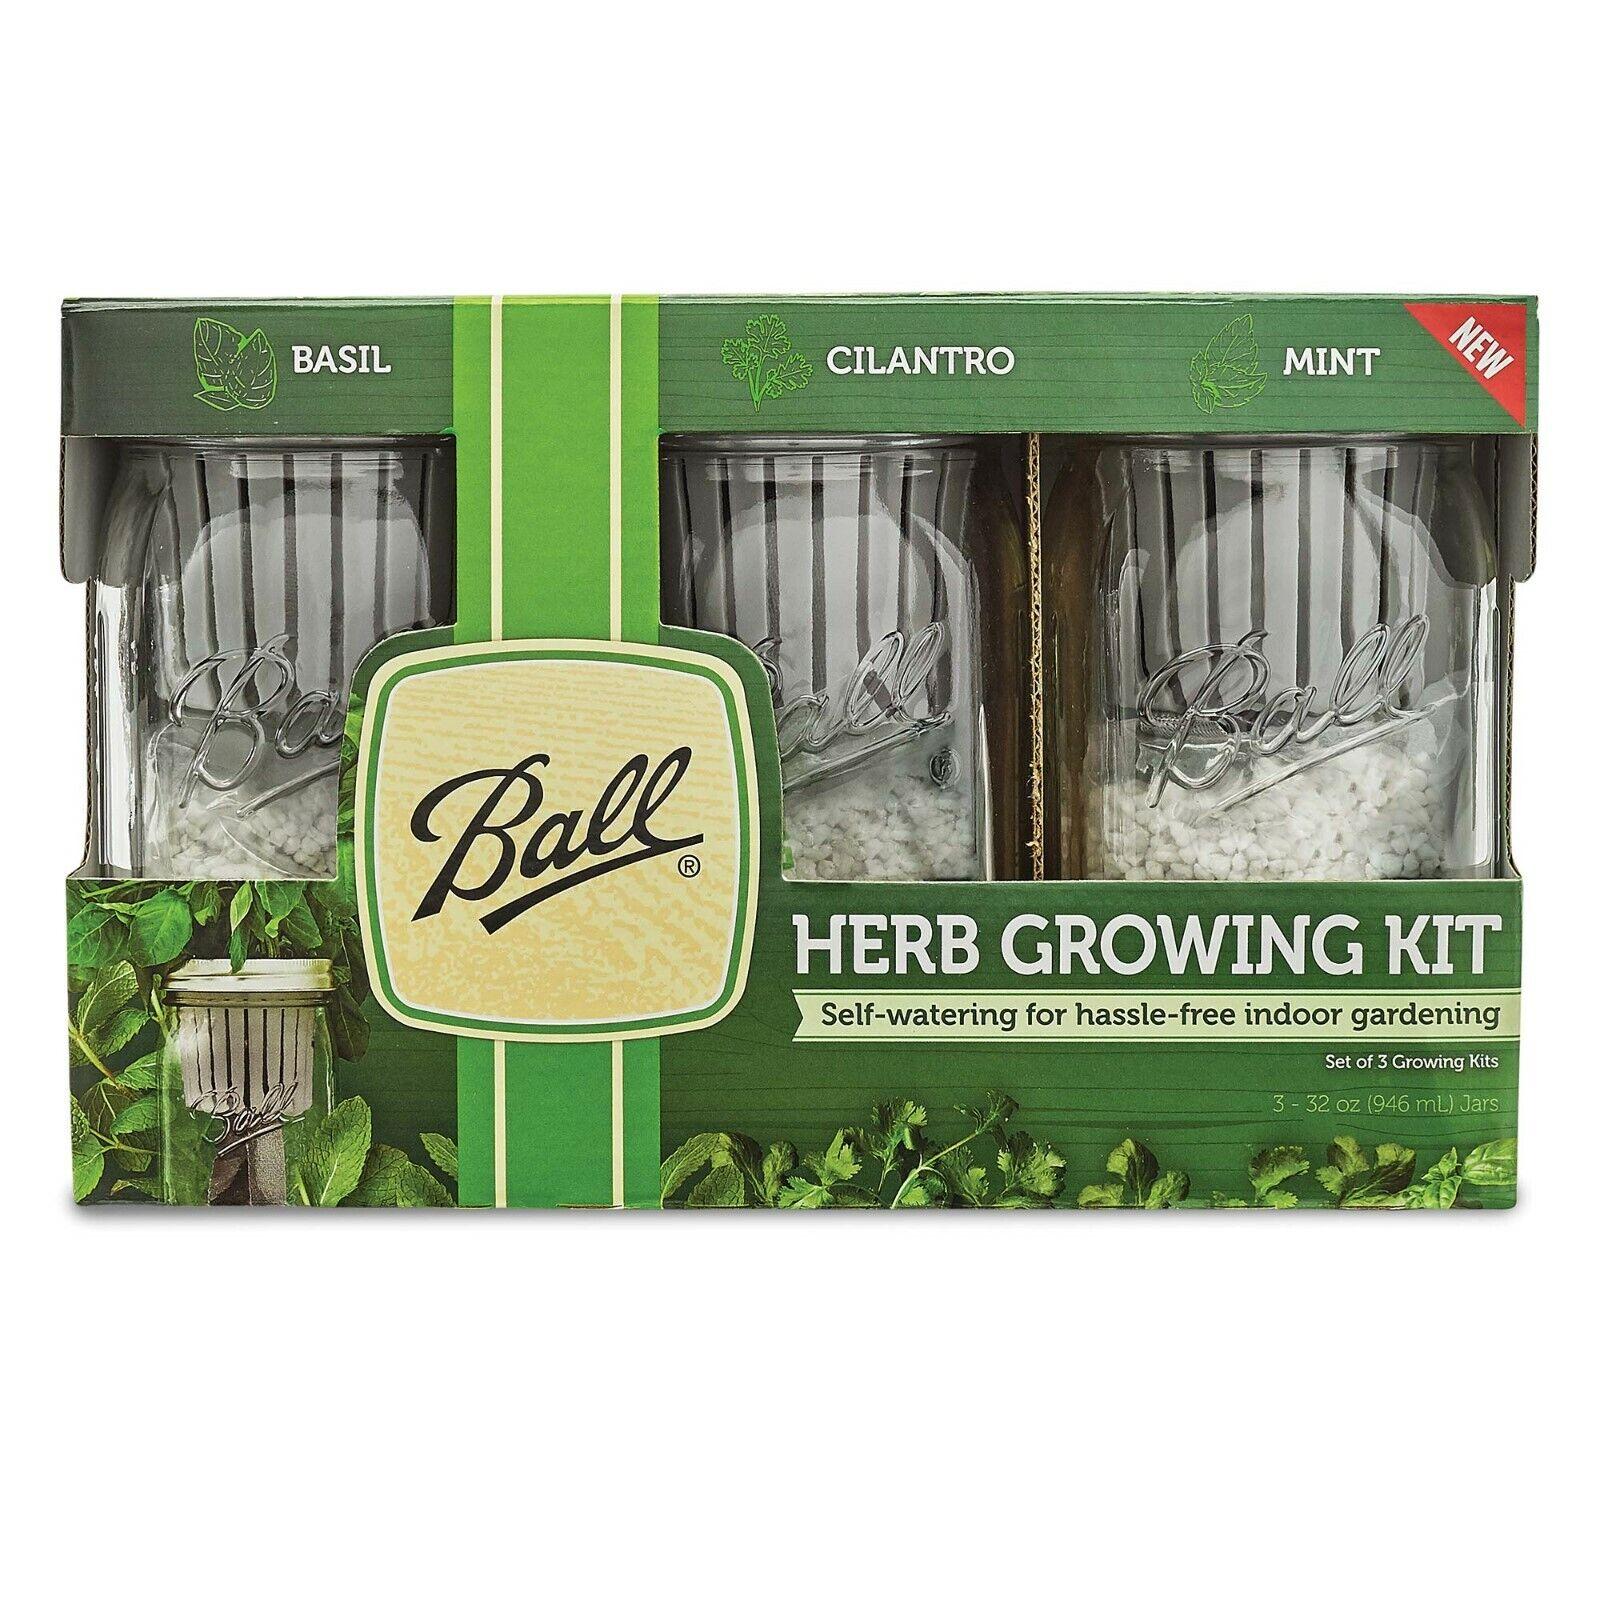 Ball Herb Growing Kit 3 Jars Basil Cilantro Mint Self-Watering Indoor Gardening 1